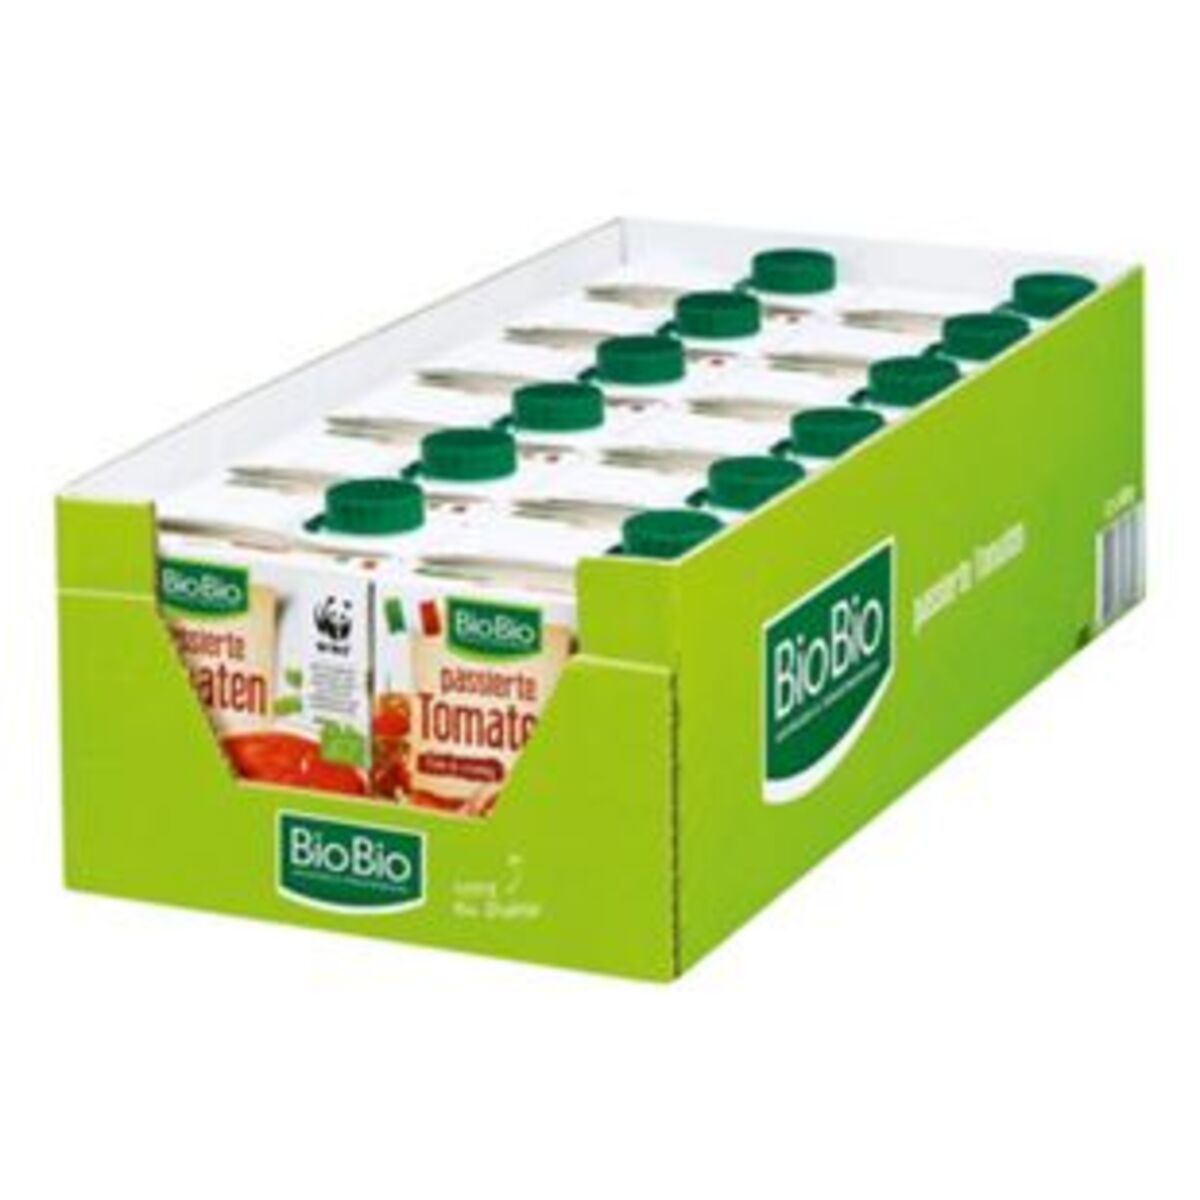 Bild 2 von BioBio Passierte Tomaten 500 g, 12er Pack